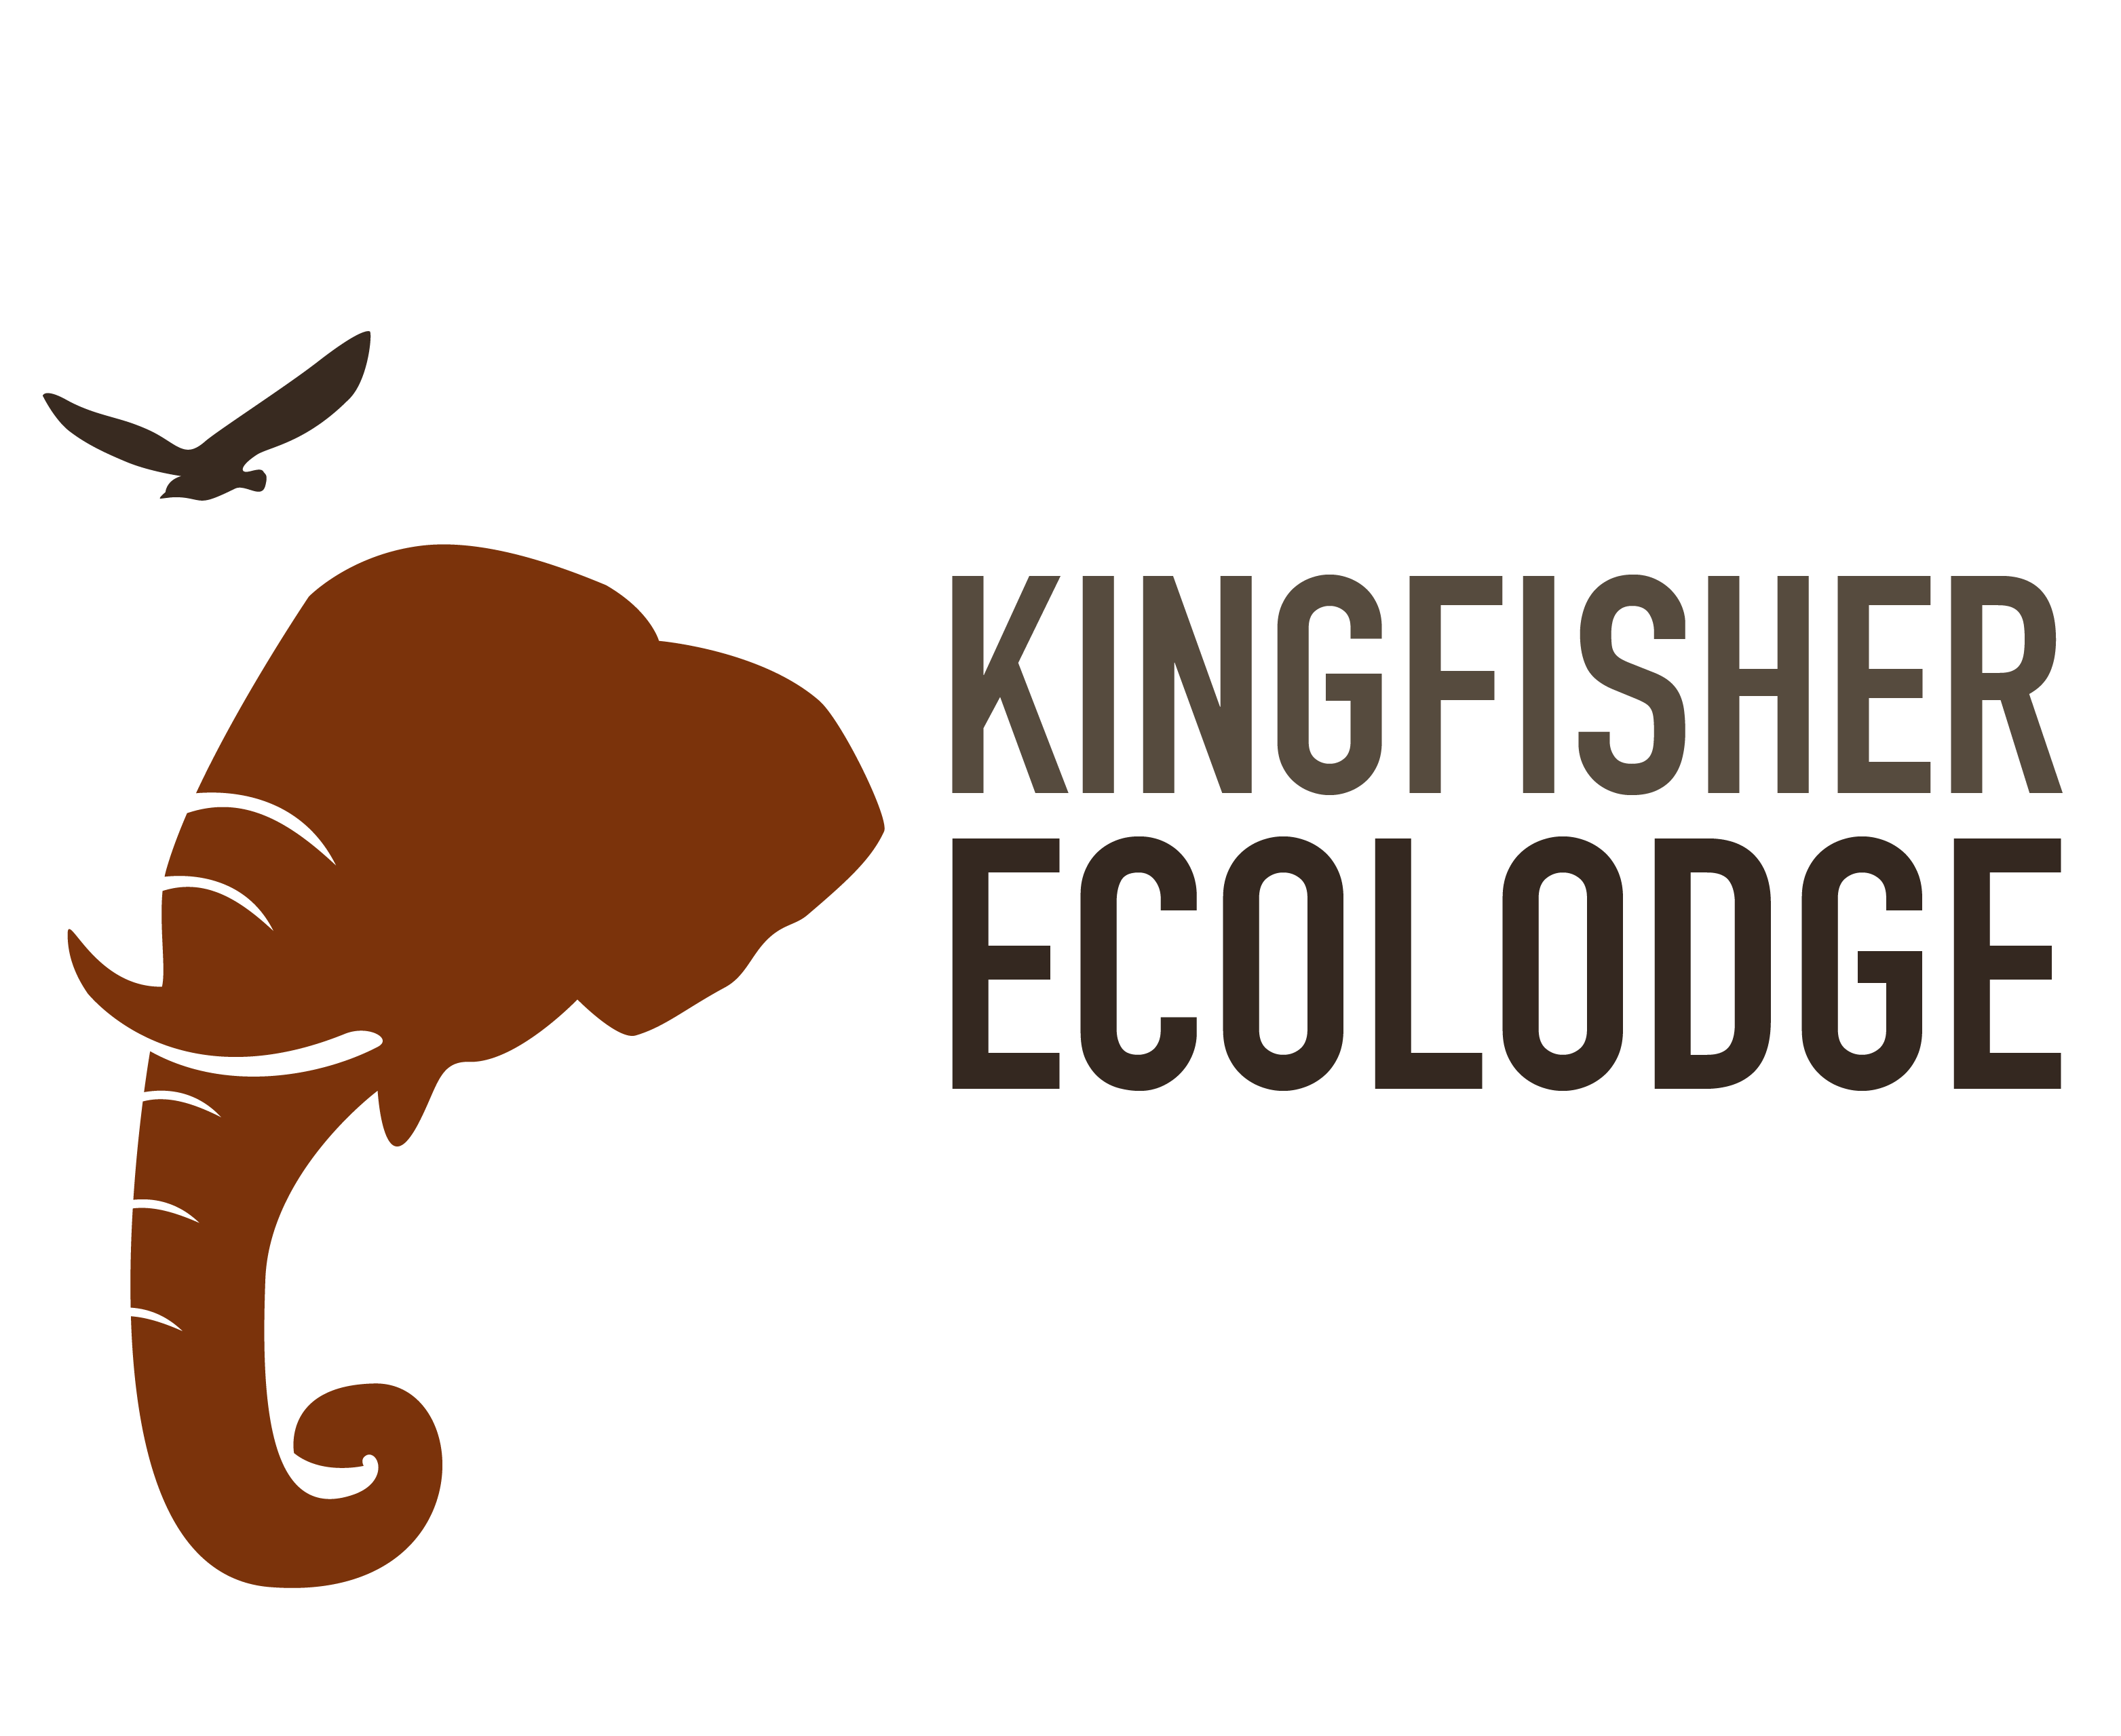 Hiker clipart jungle trekking. Kingfisher ecolodge logo